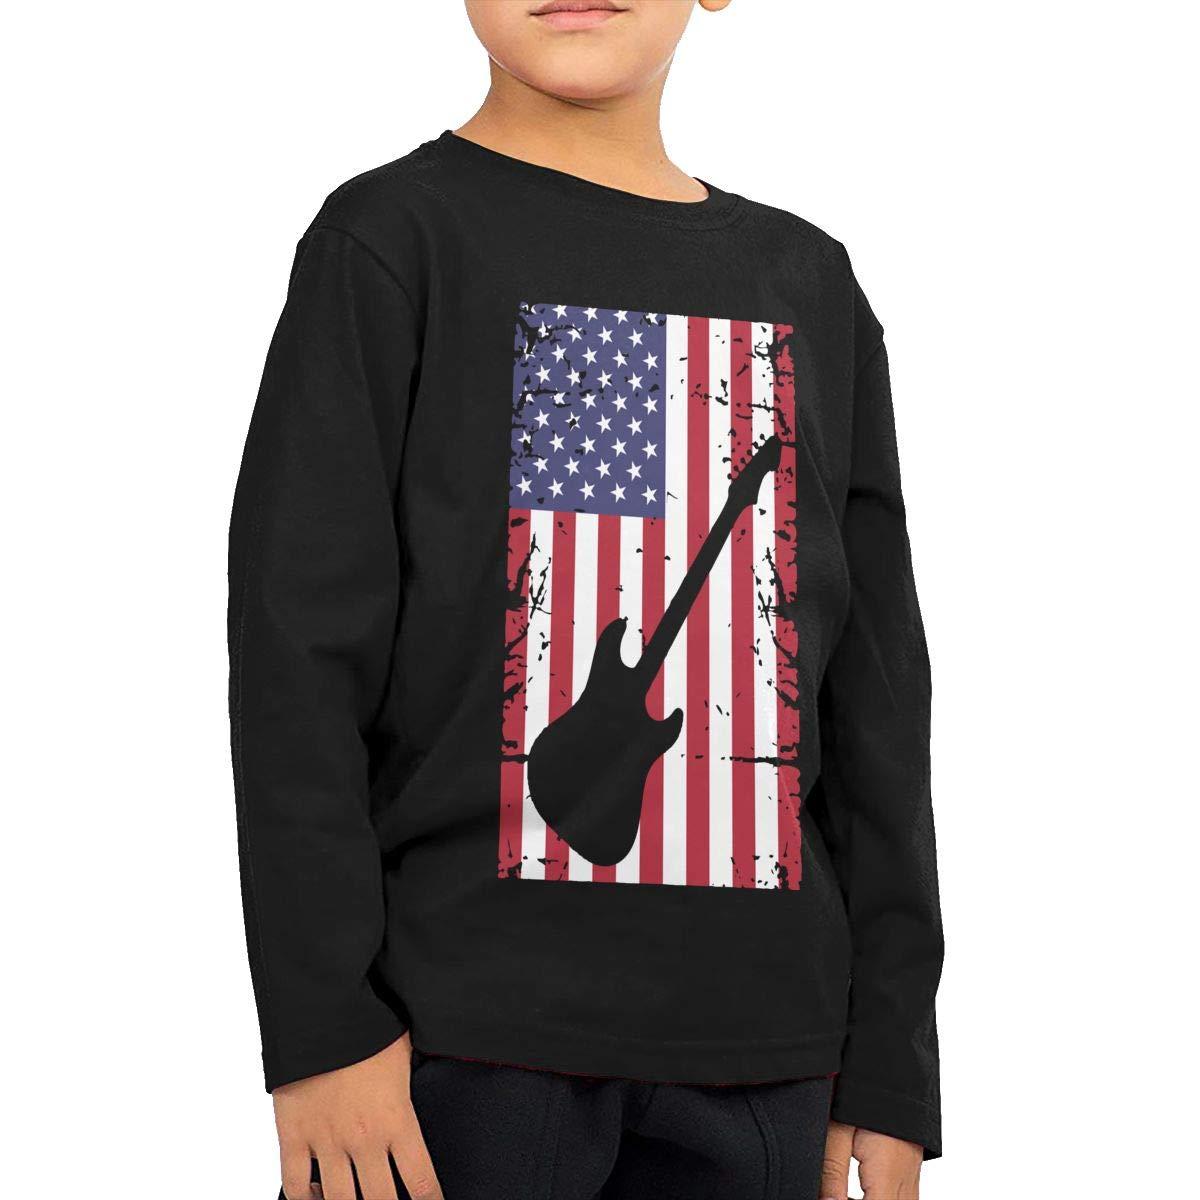 CERTONGCXTS Toddler Guitar American Flag ComfortSoft Long Sleeve Tee